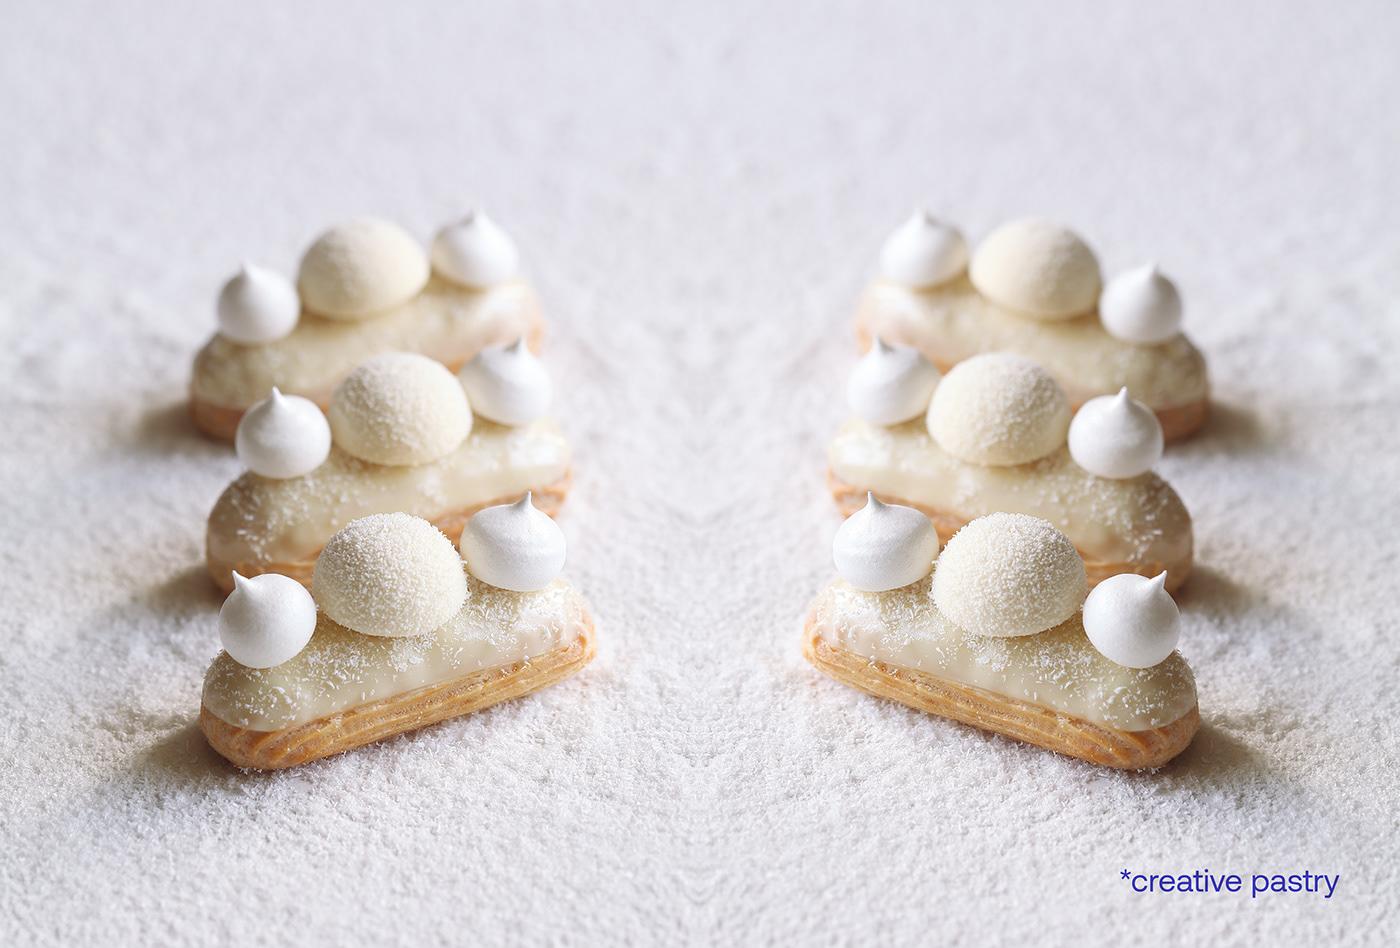 baking brand brandidentity branding  cakes corporateidentity design identitydesign logo Patisserie